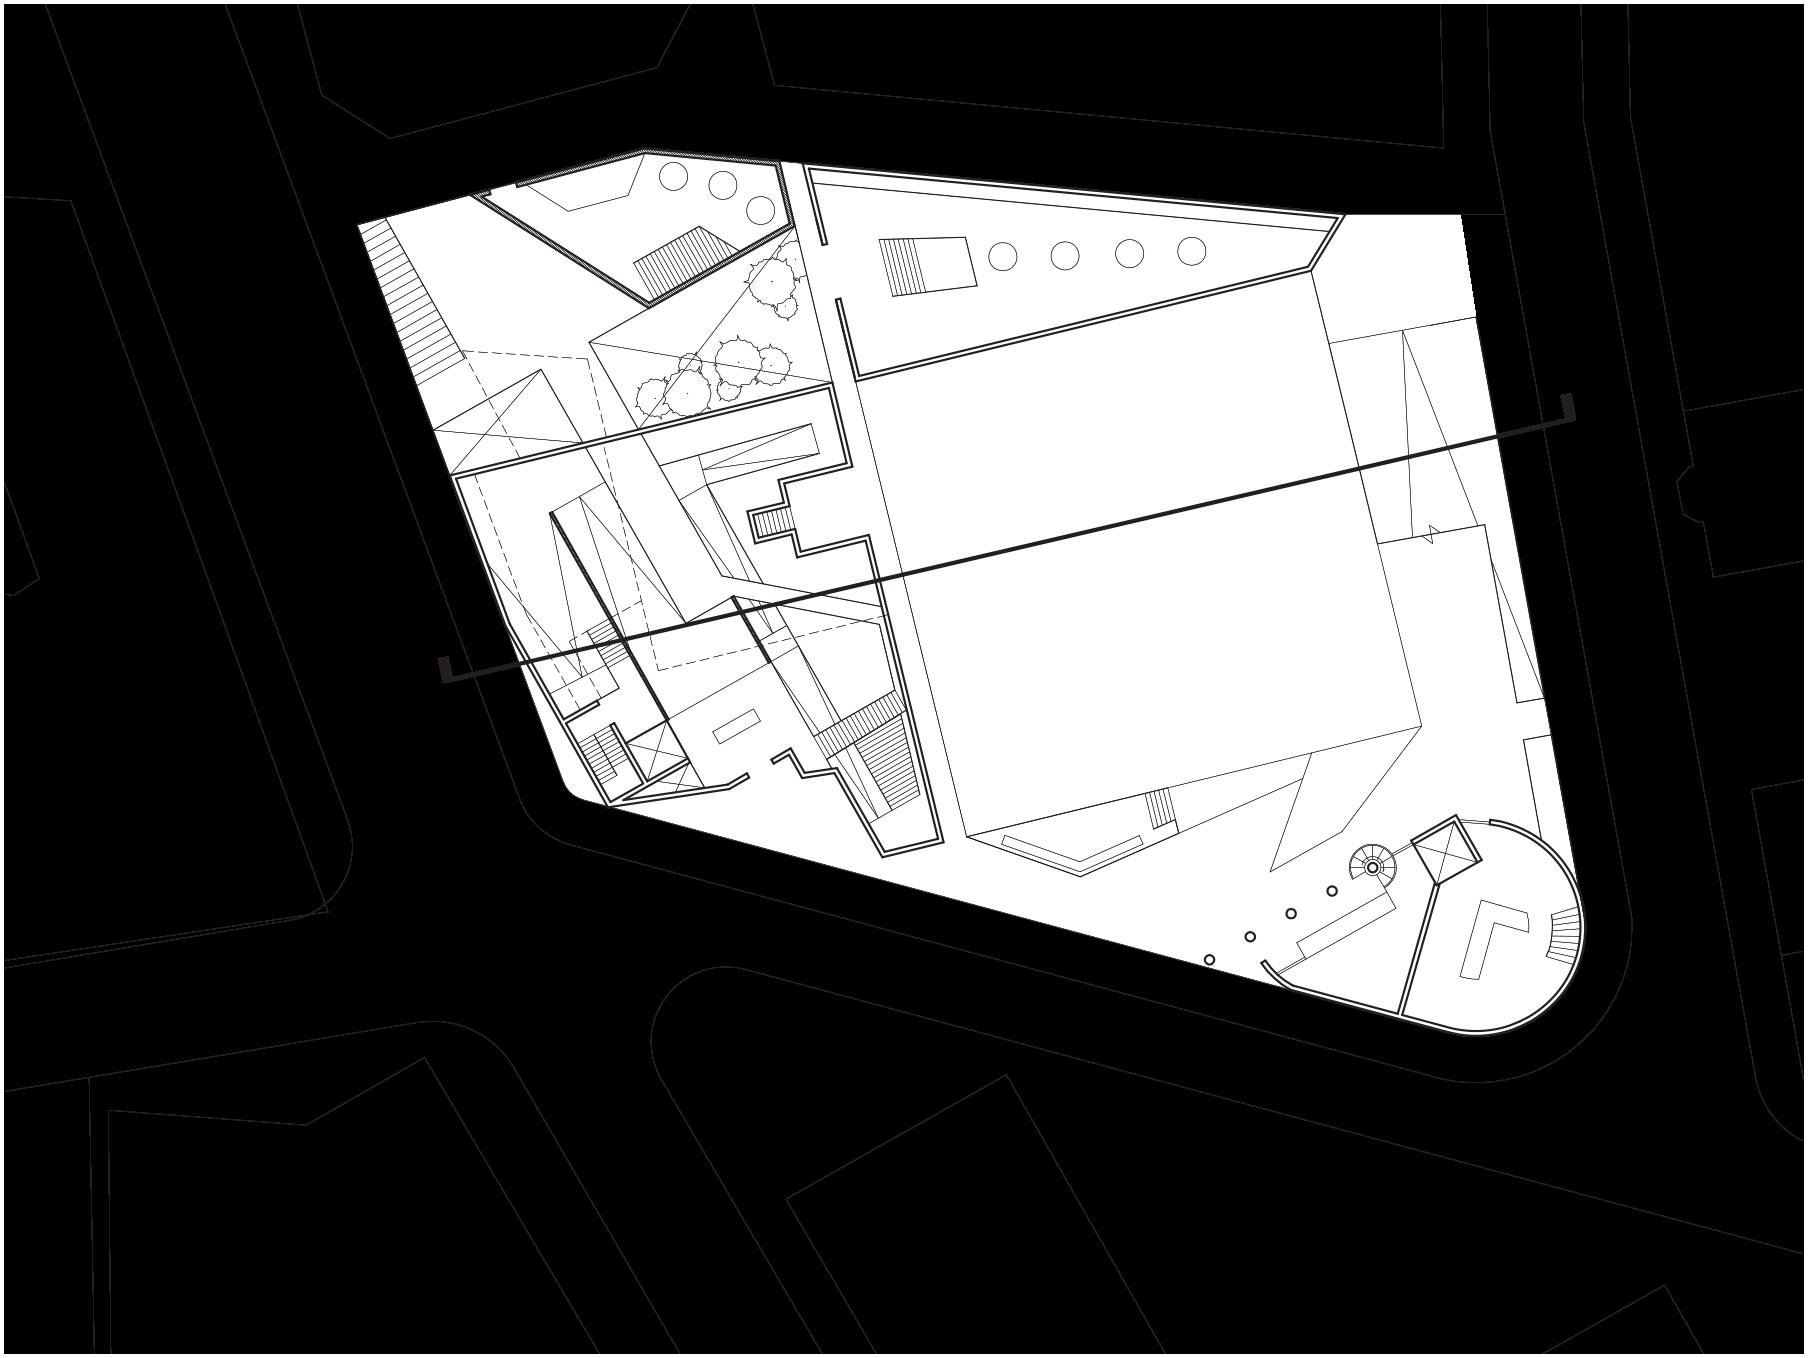 plate floor plan 2.png